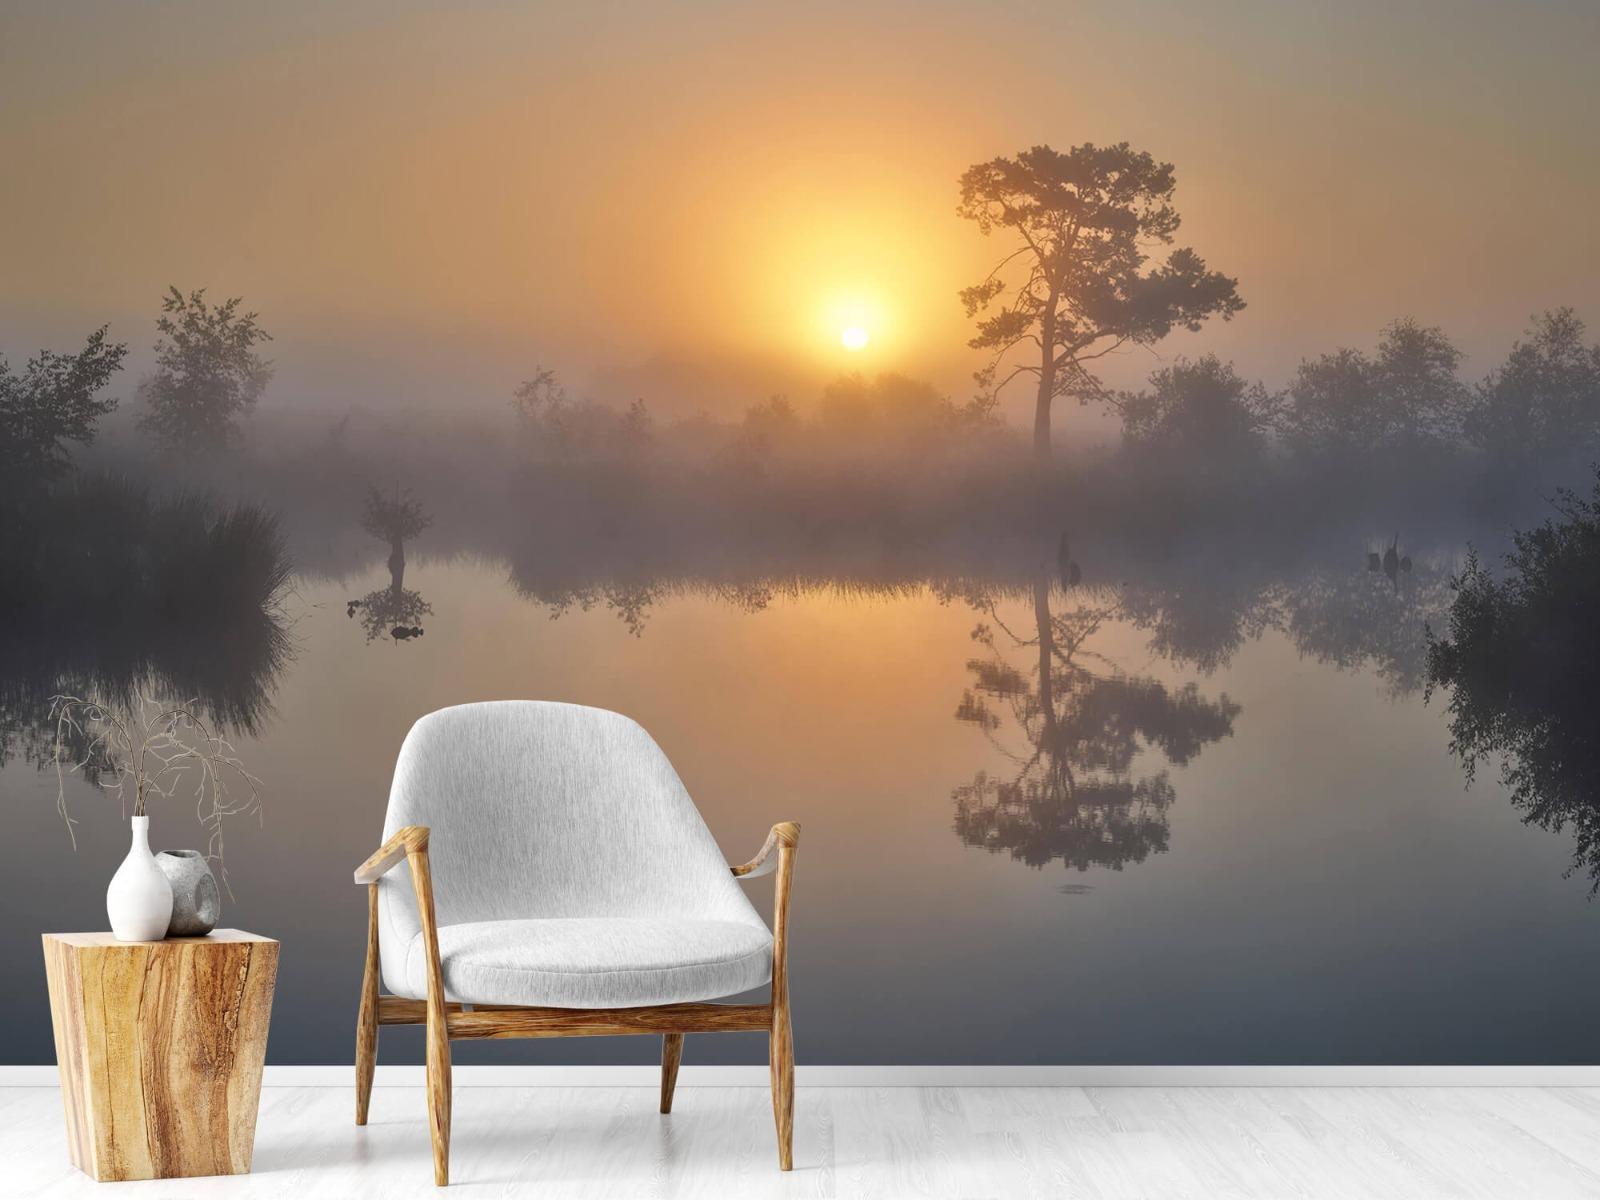 Natuur - Mistige zonsopkomst 2